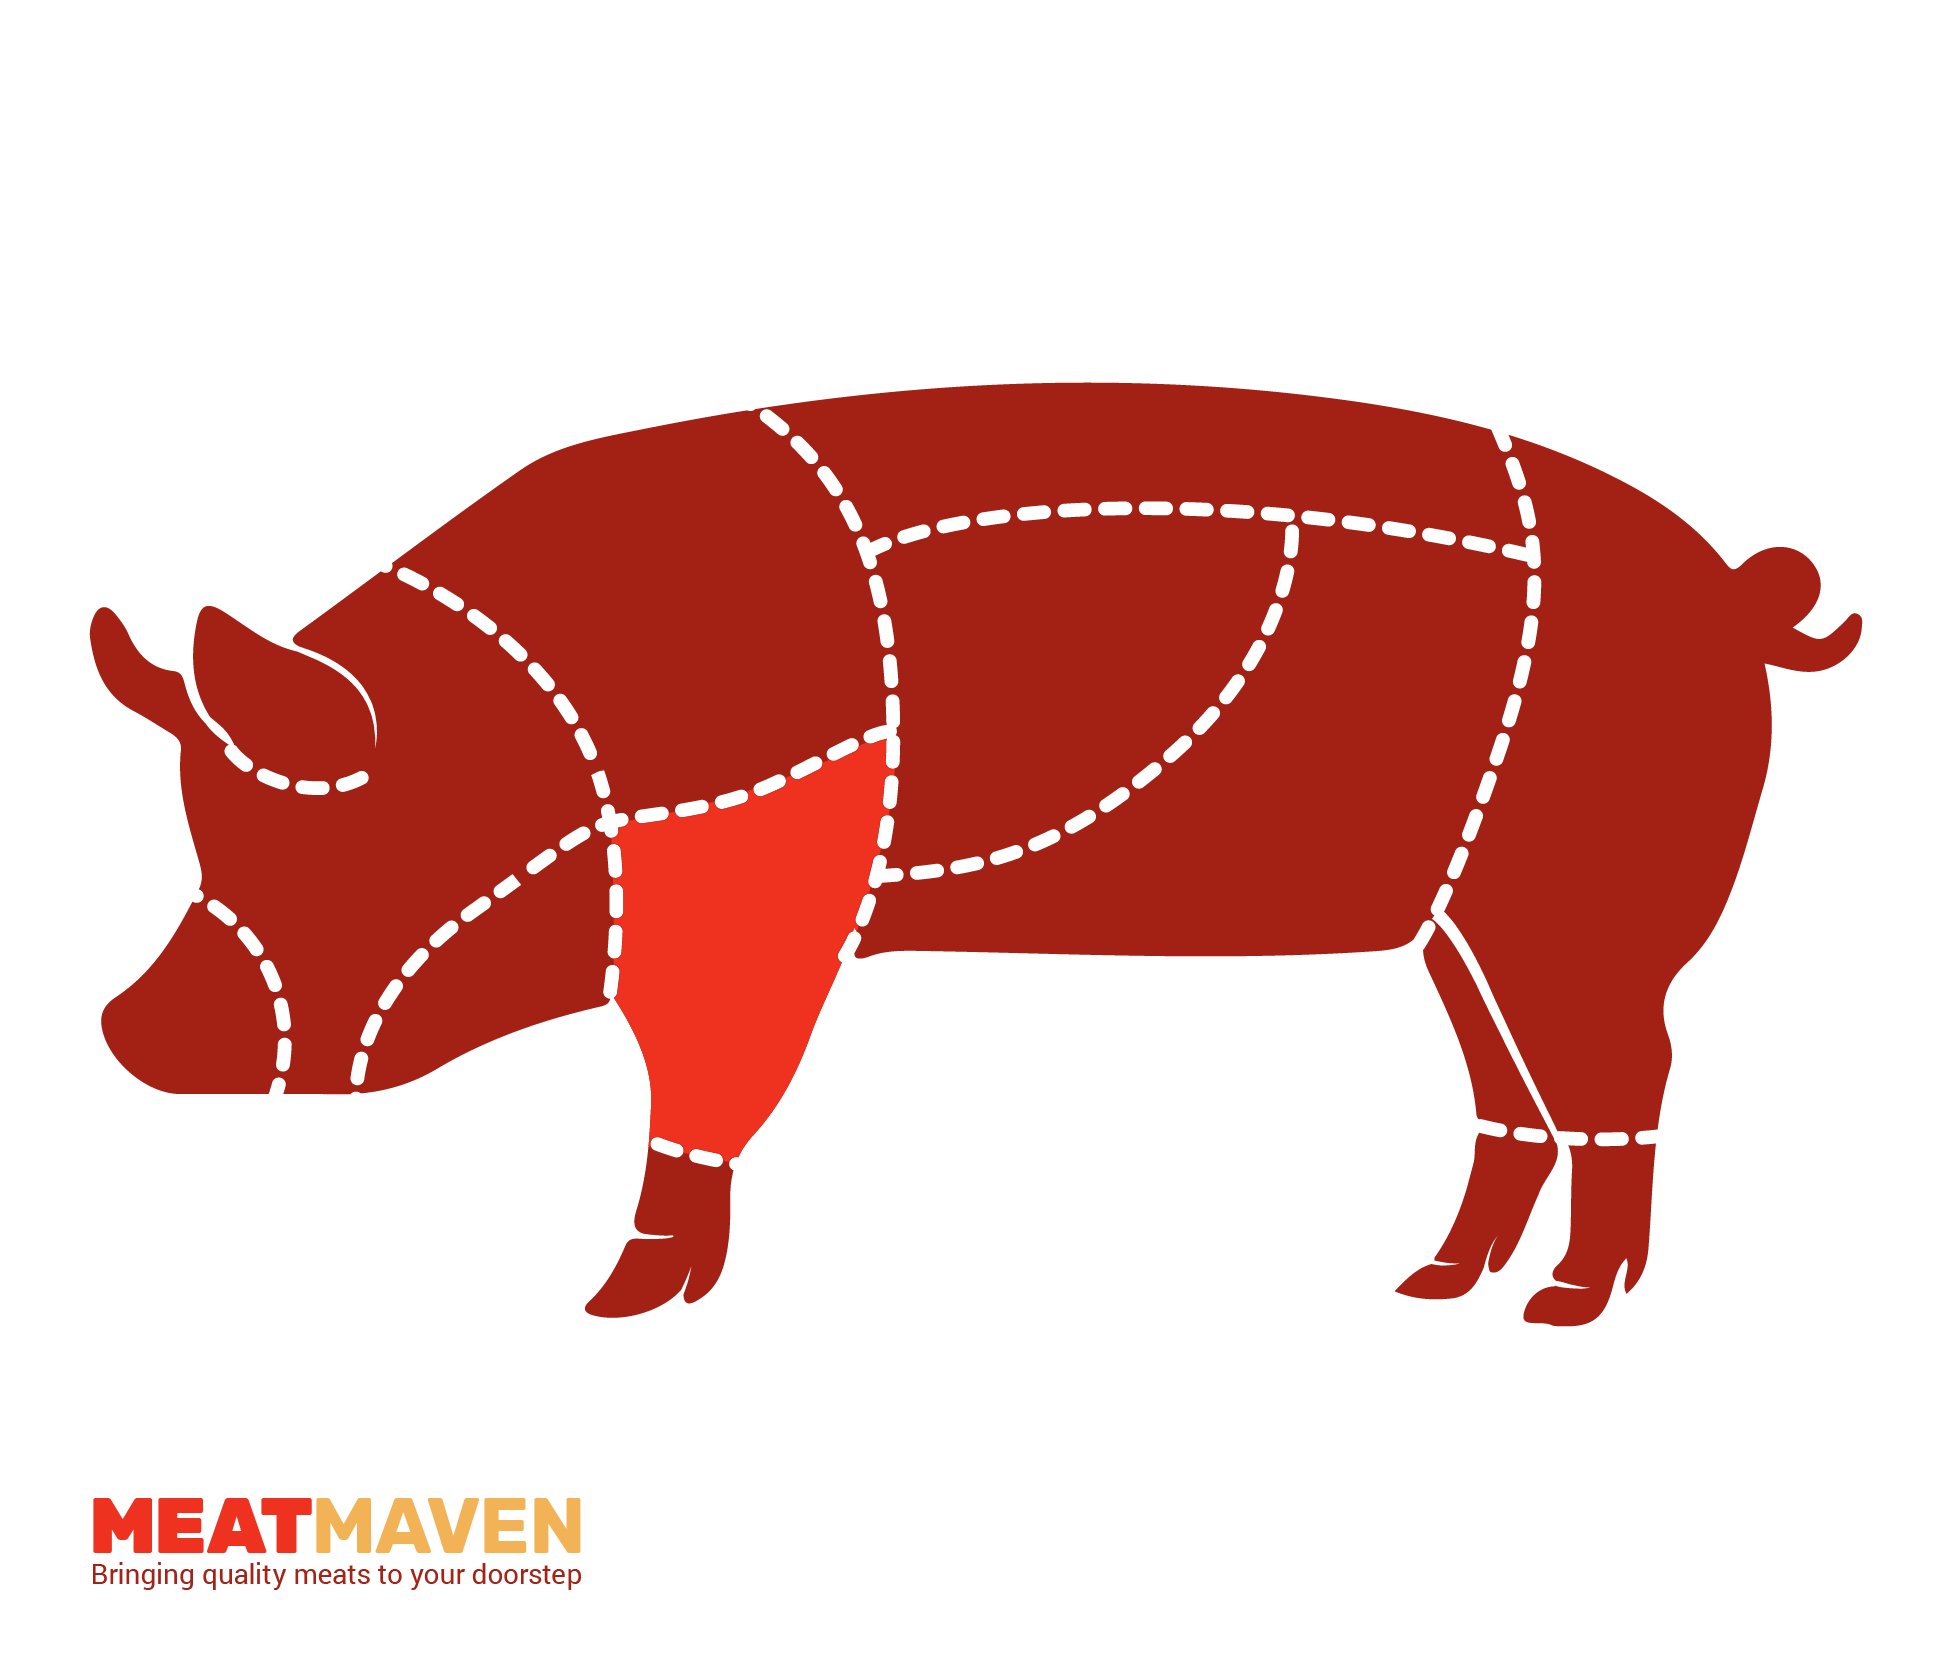 Pork Humerus Bone Cut - 2 kg - Meat Maven